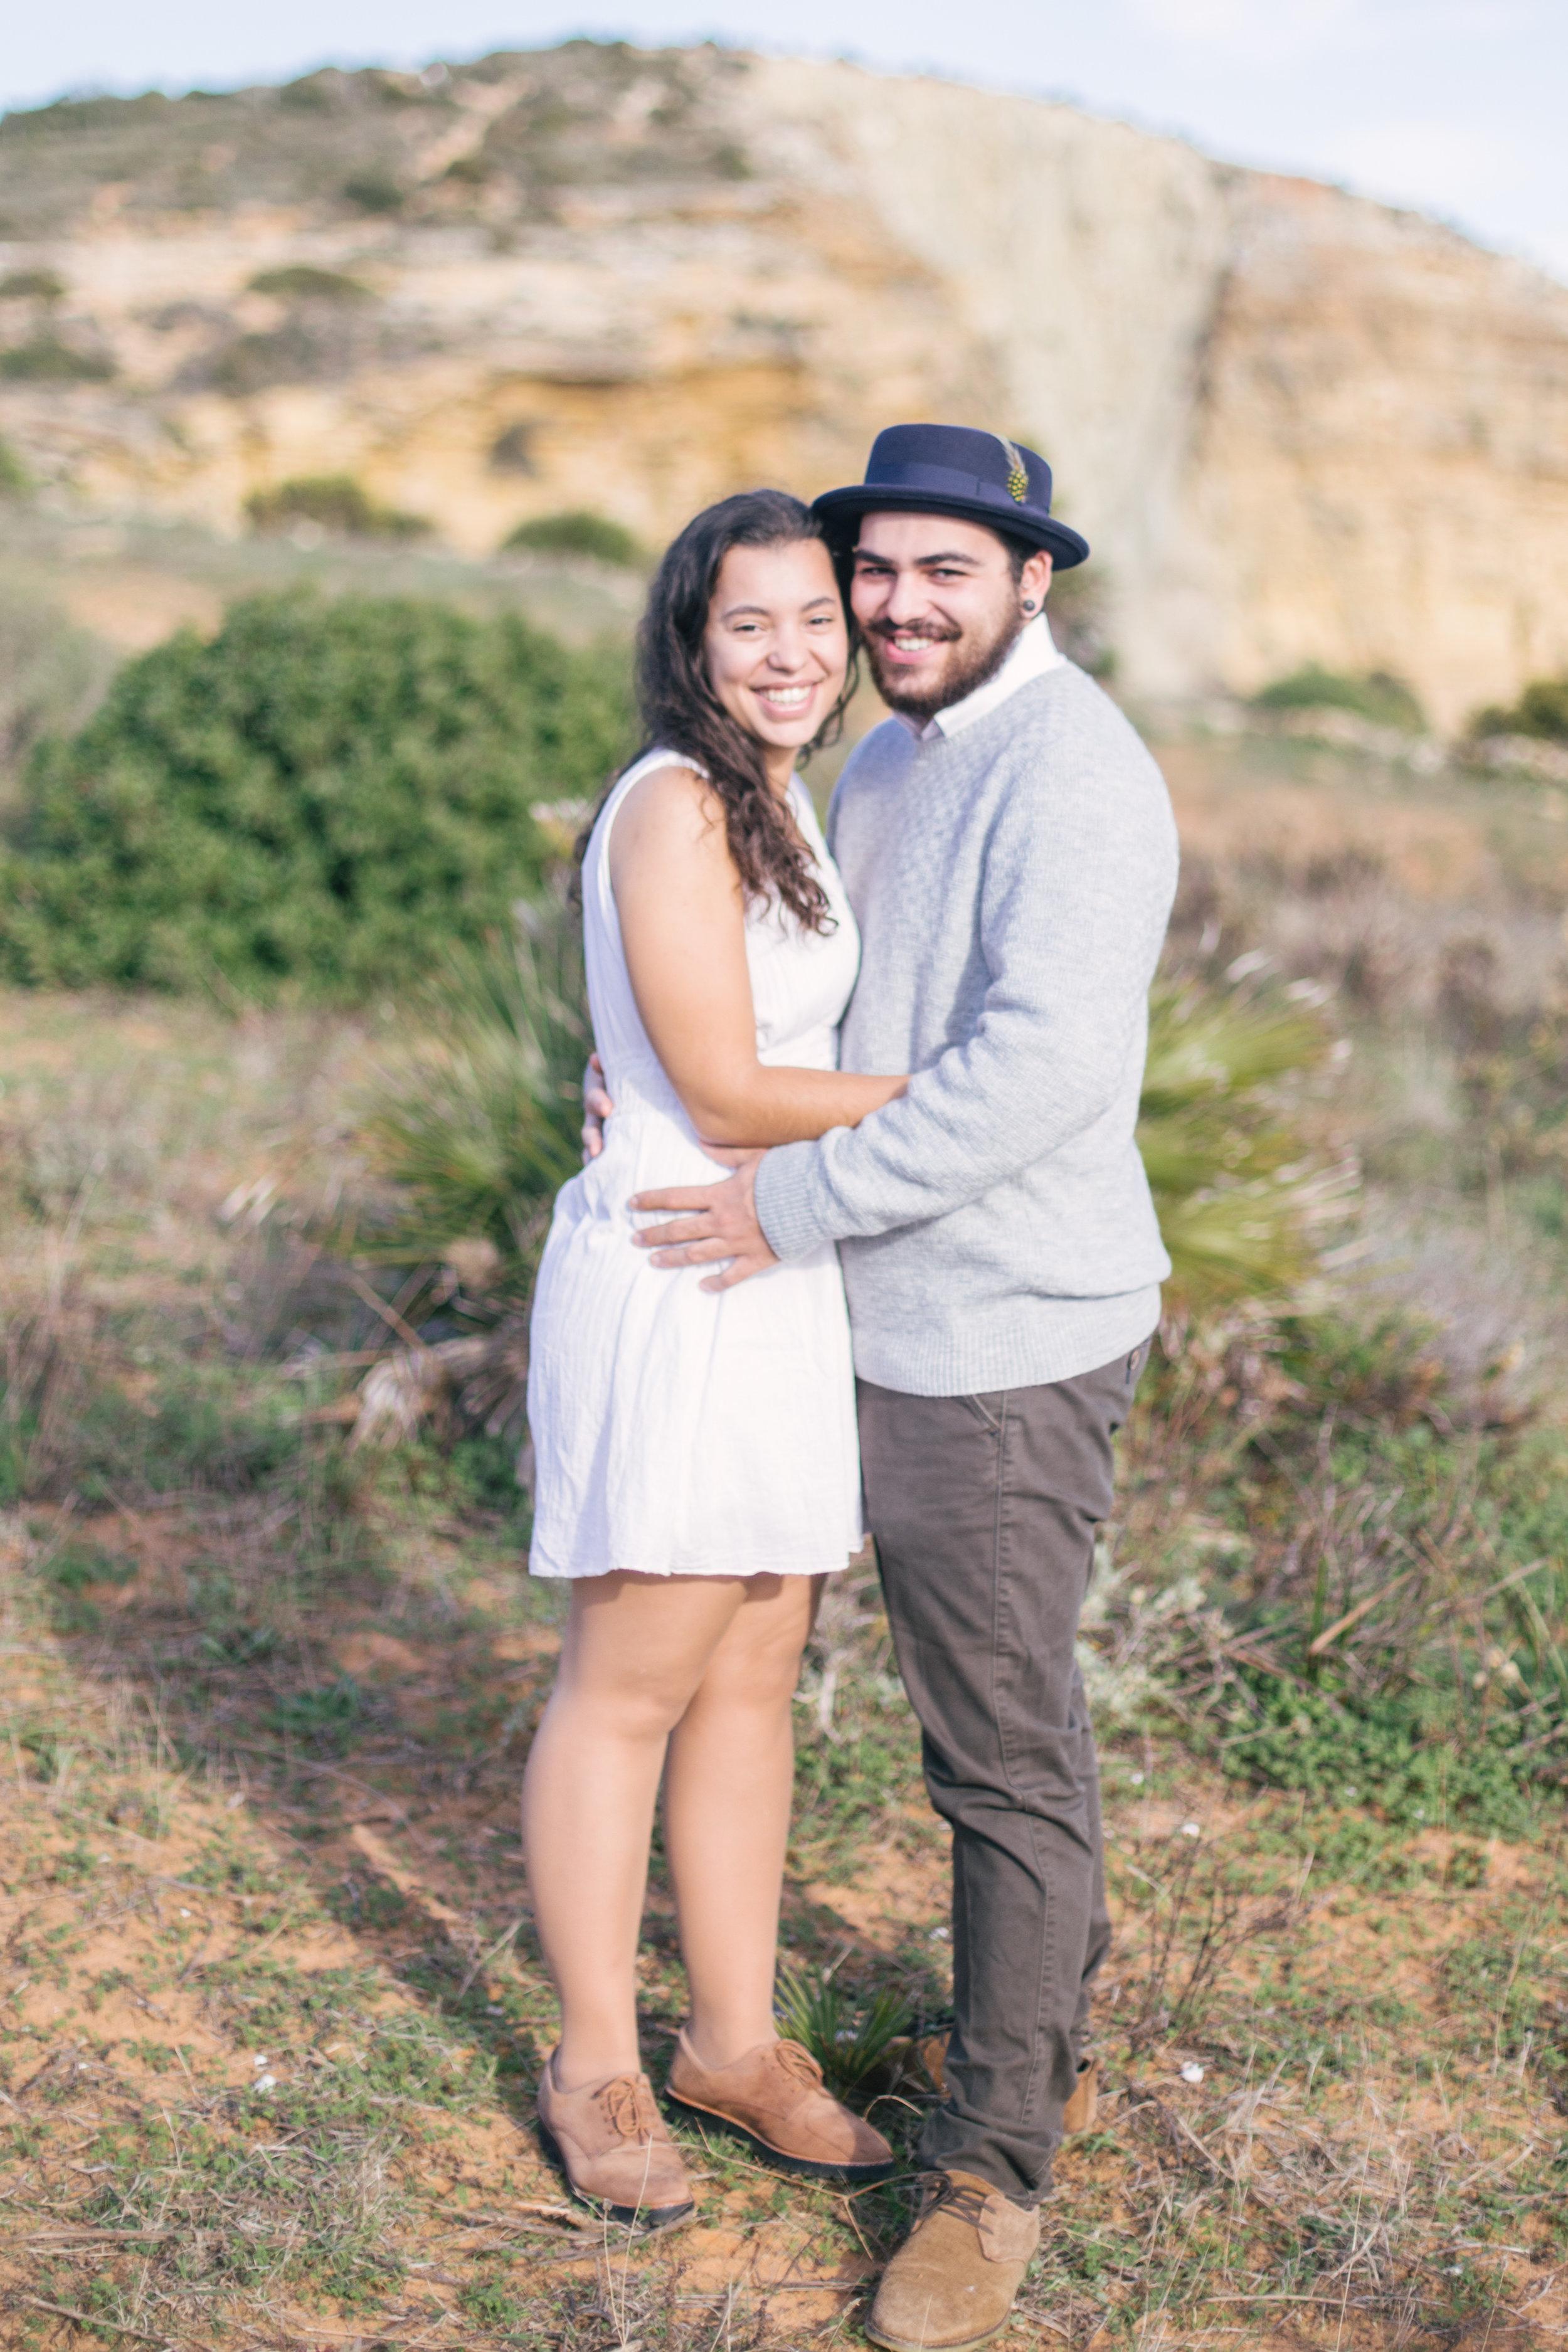 Sandra&Bernardo_v2_Nov13-46.jpg